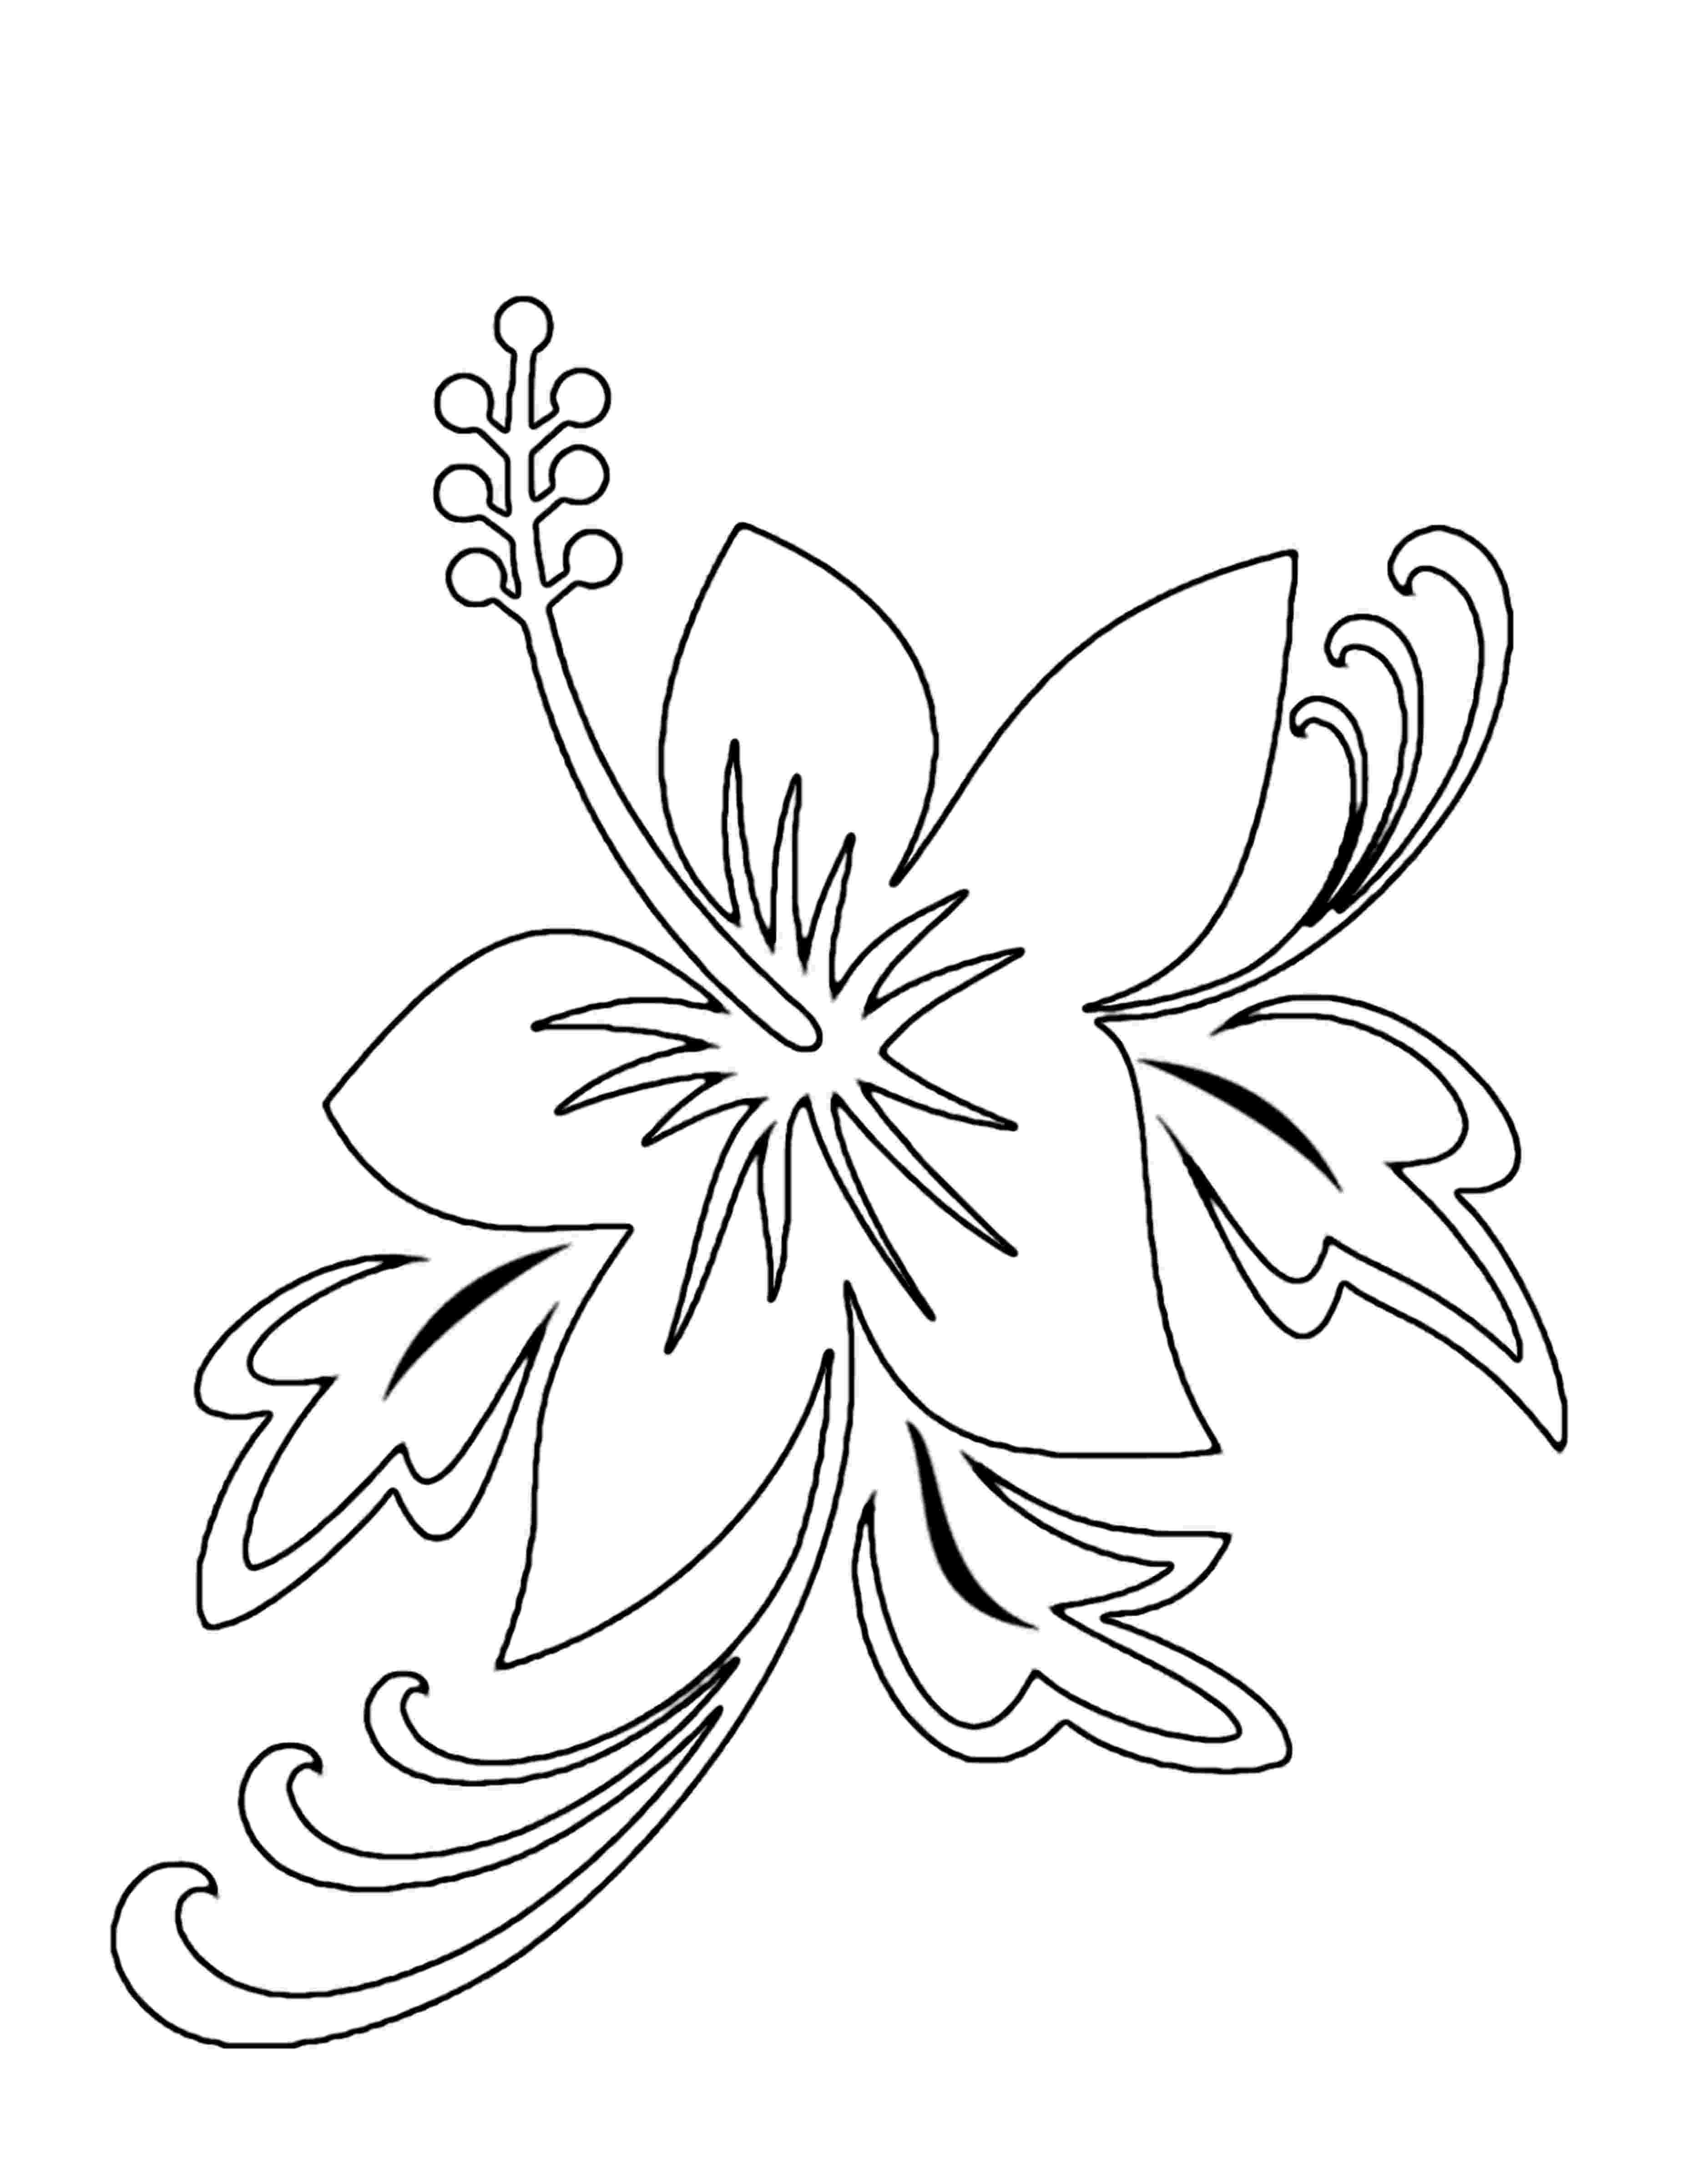 flower printouts babyz flowers different flowers patterns printouts flower